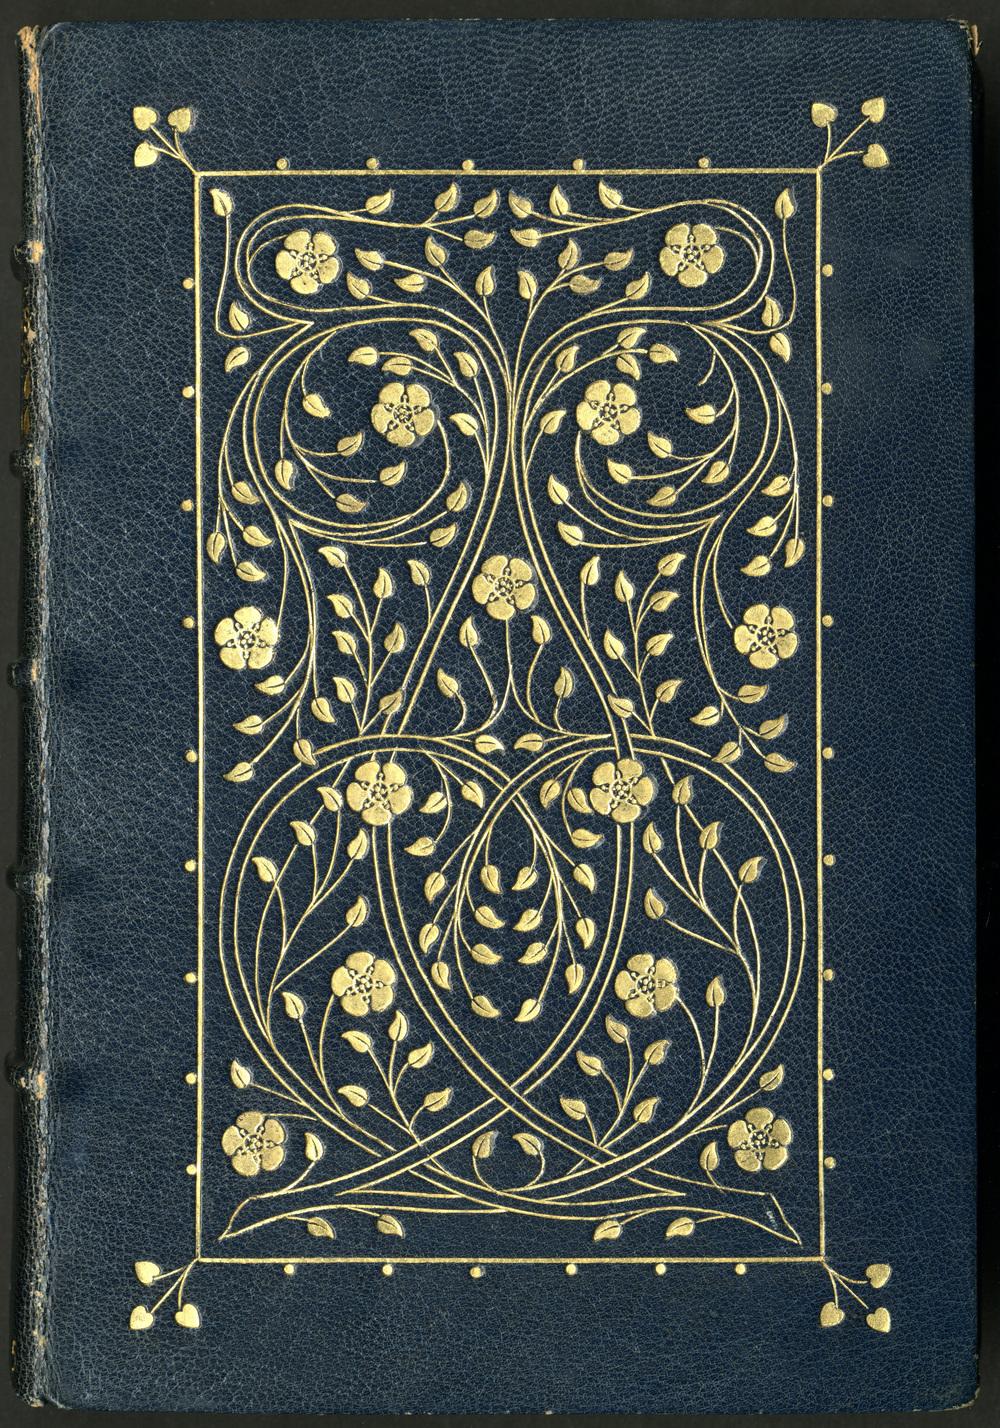 Walter Horatio Pater, Miscellaneous studies